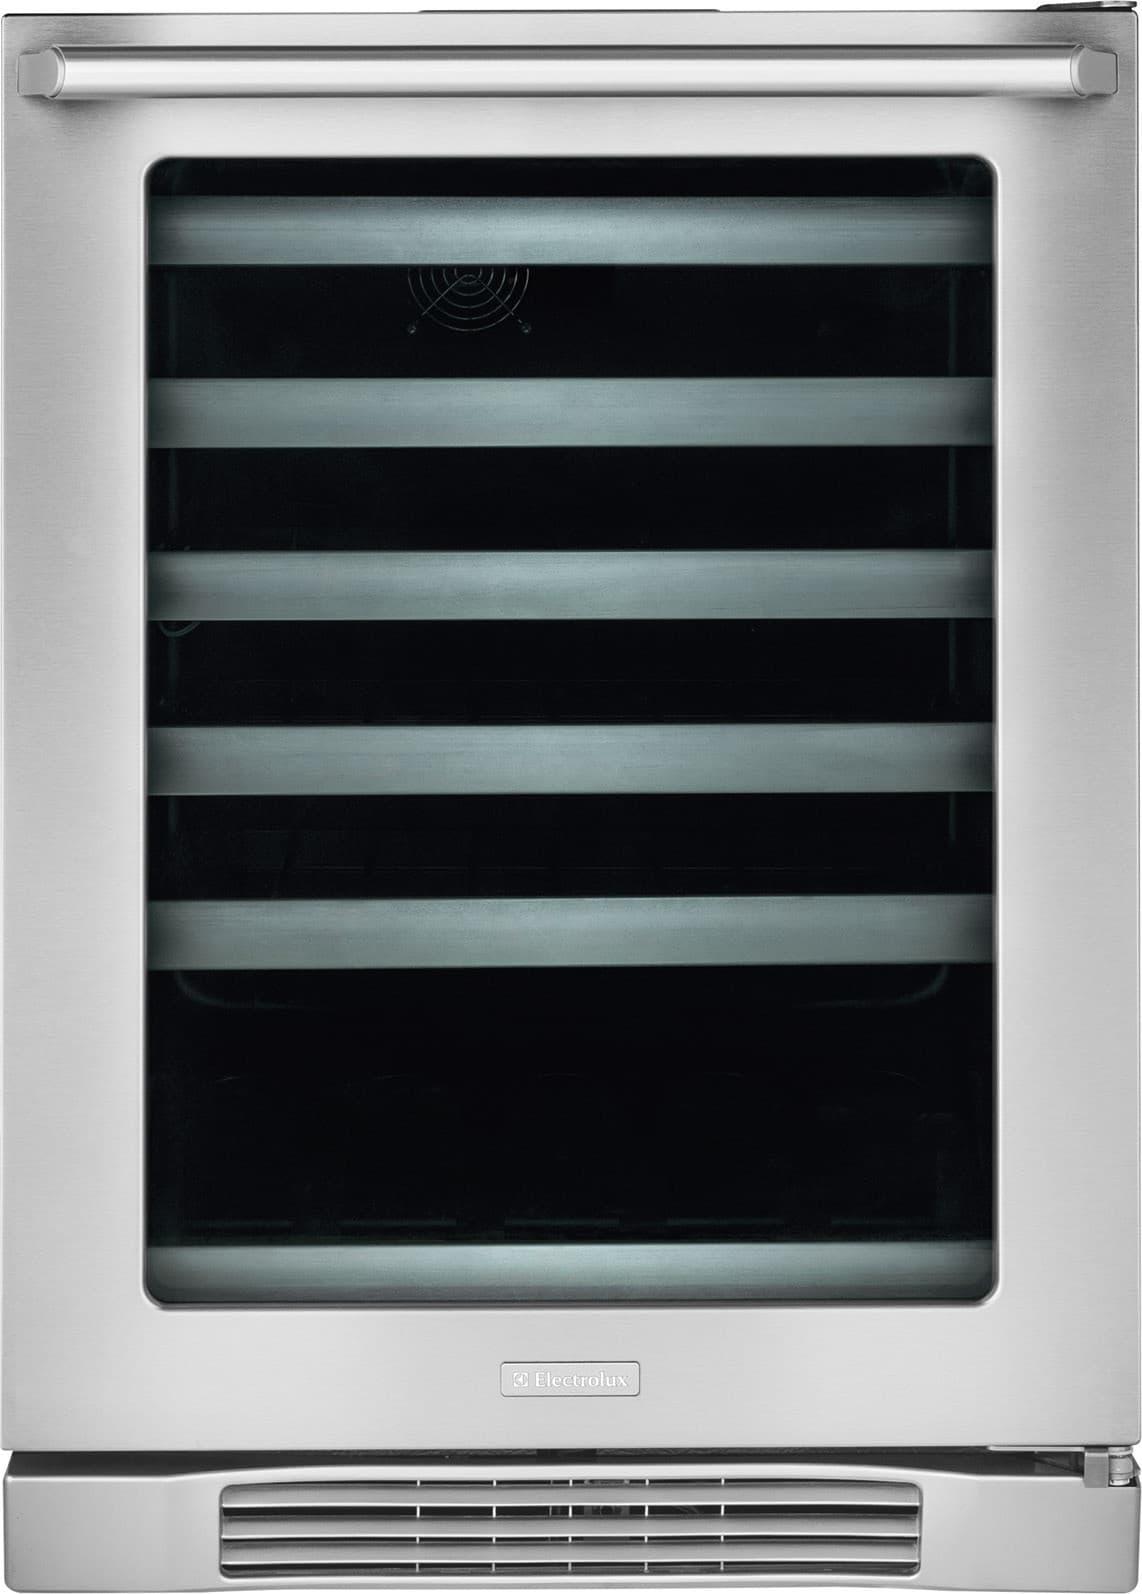 Electrolux Ei24wl10qs 24 Inch Undercounter Wine Cooler